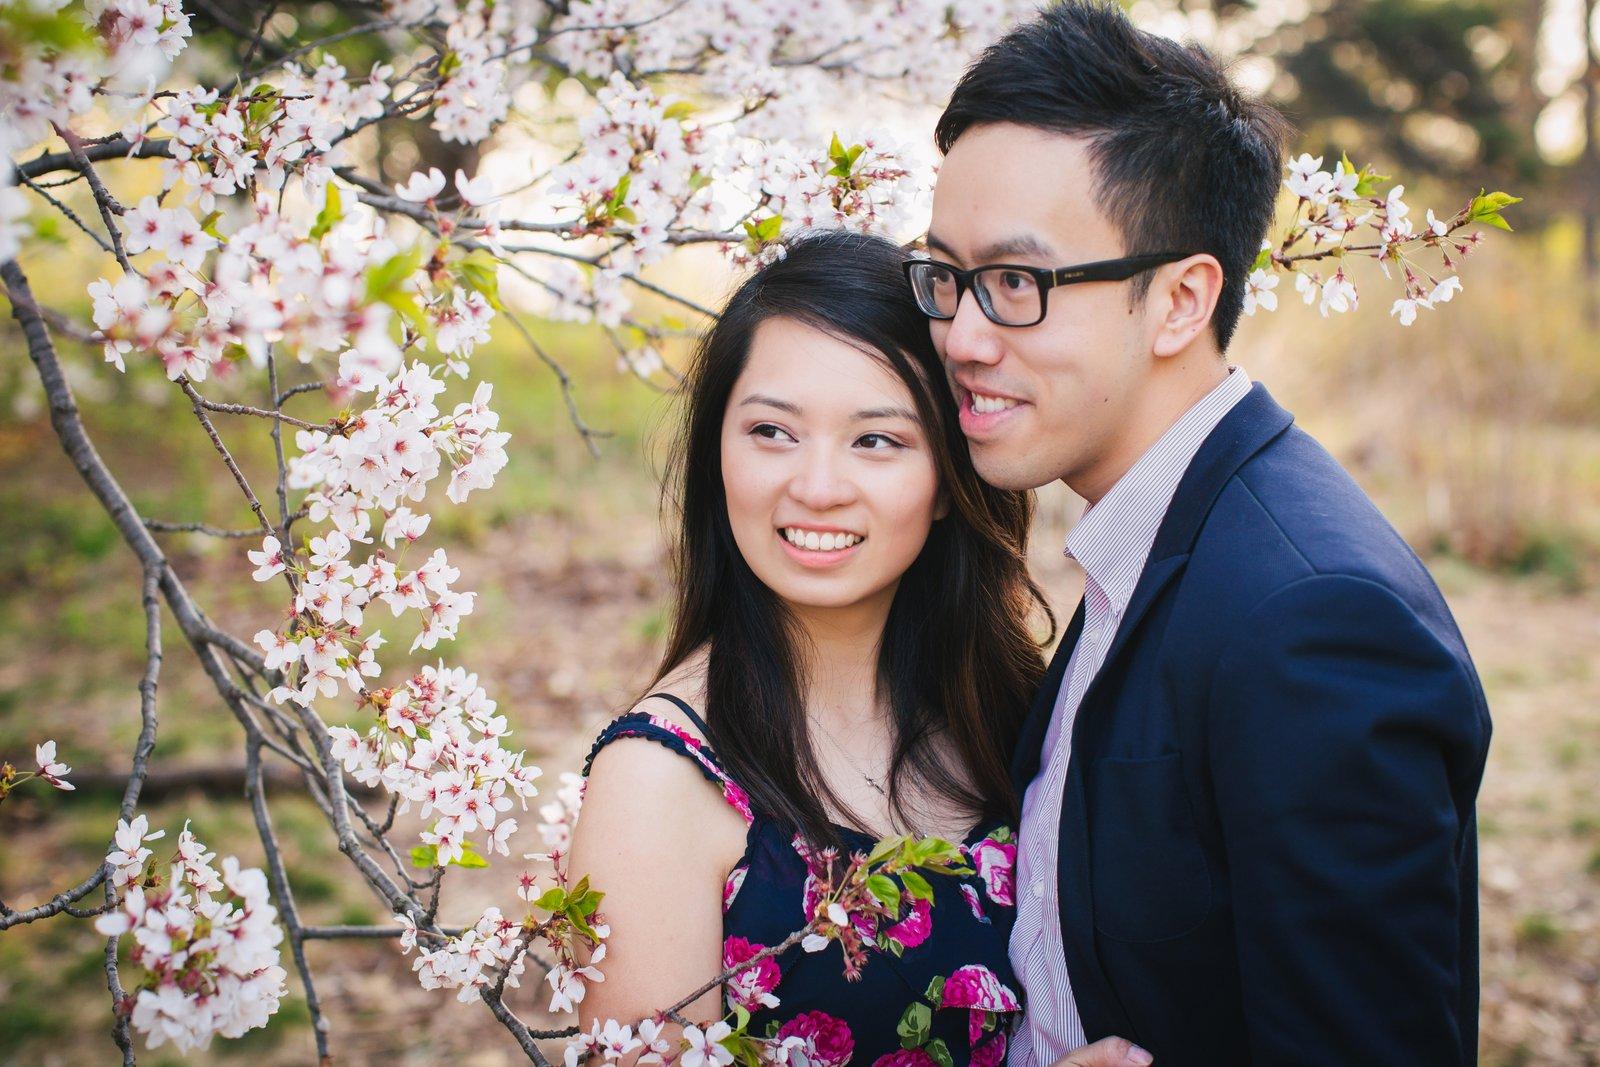 Jessica-Charles-Engagement-High-Park-Cherry-Blossom-014